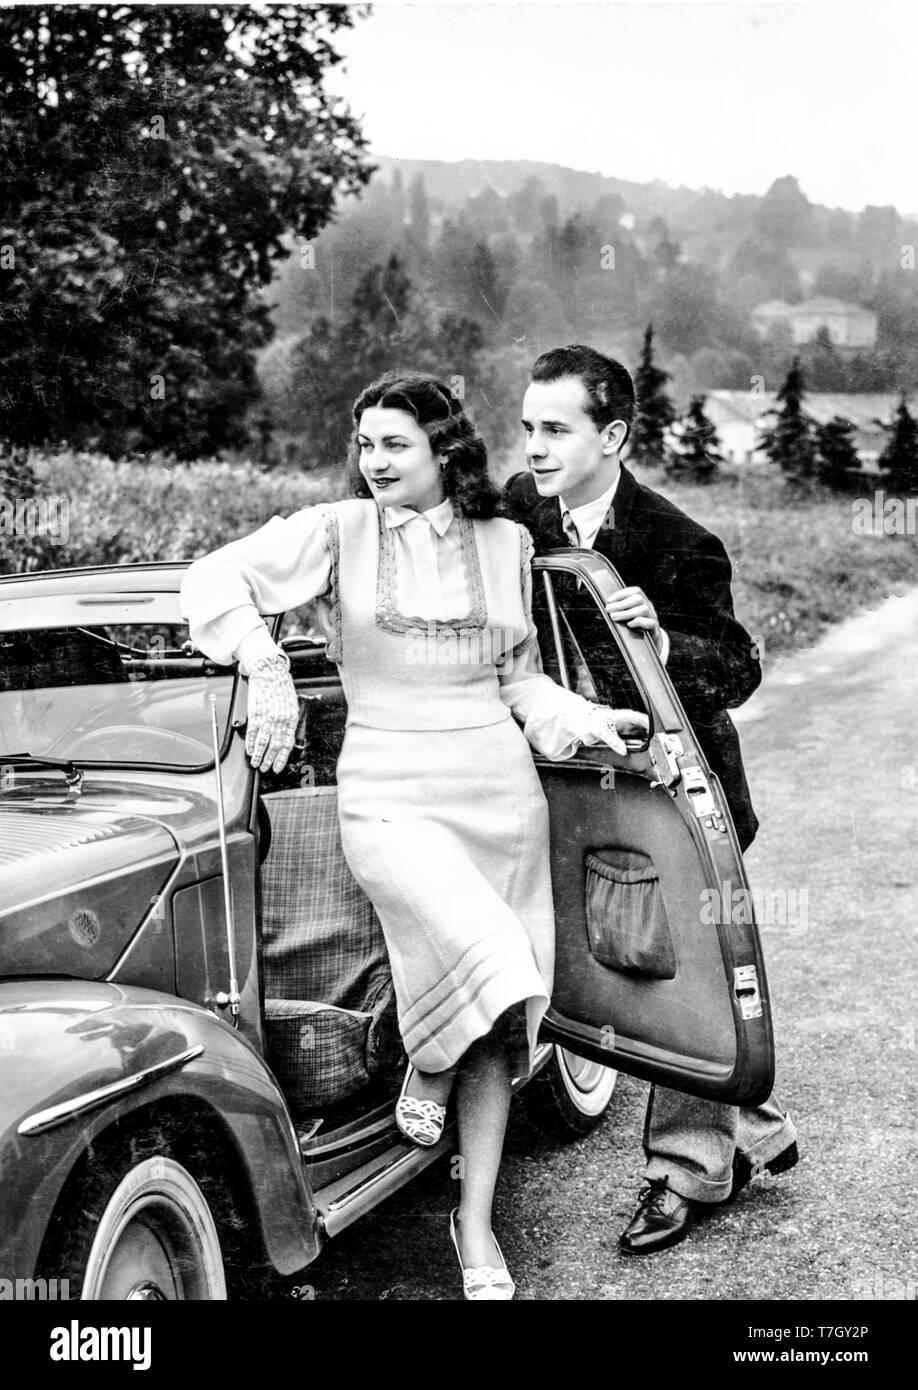 couple, car, 50s Stock Photo - Alamy